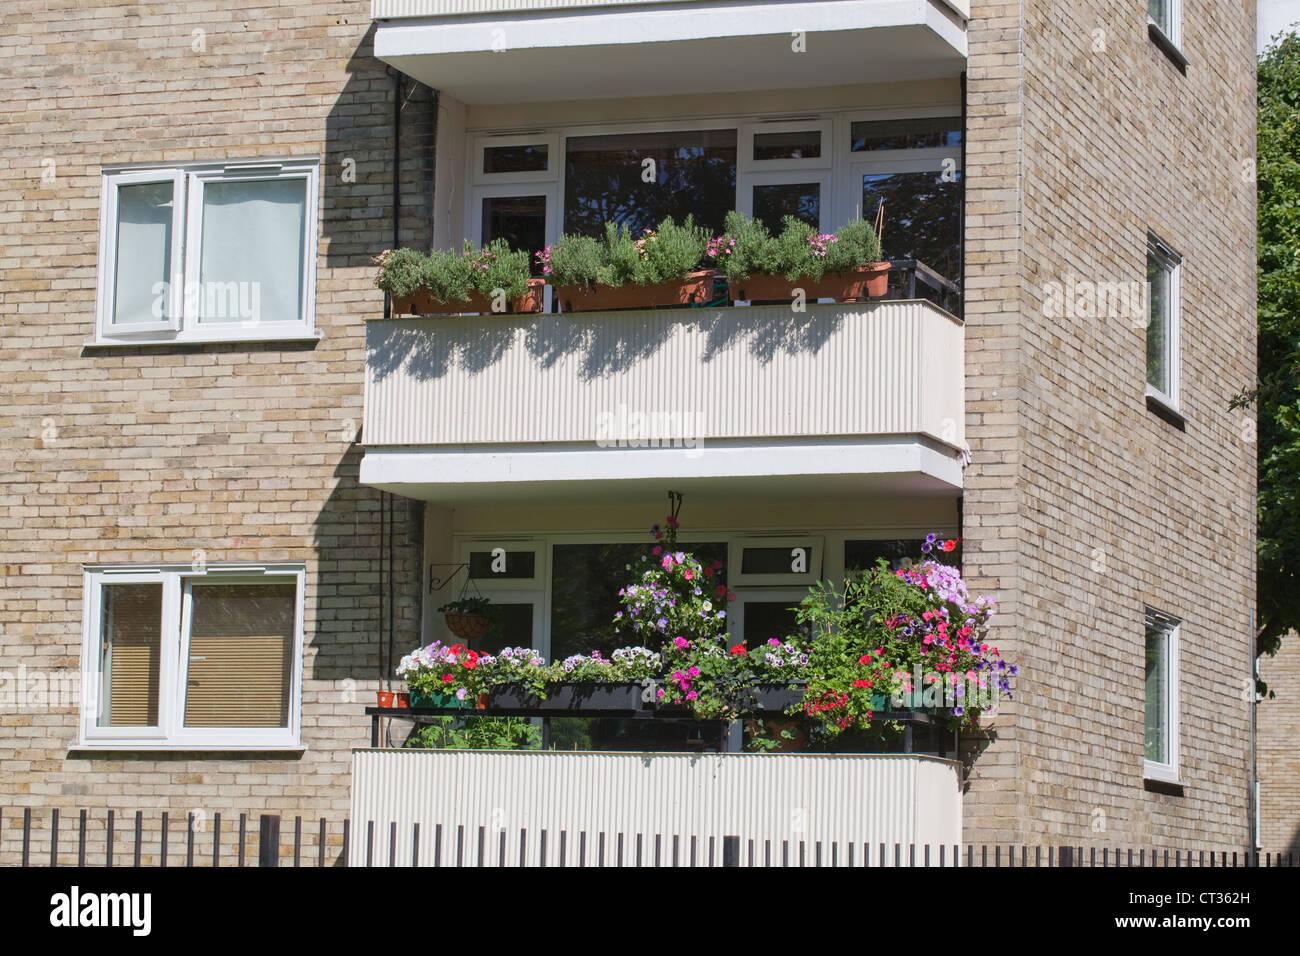 Apartments, flats, London. Colourful planted window boxes on adjacent balconies. Stoke Newington. - Stock Image